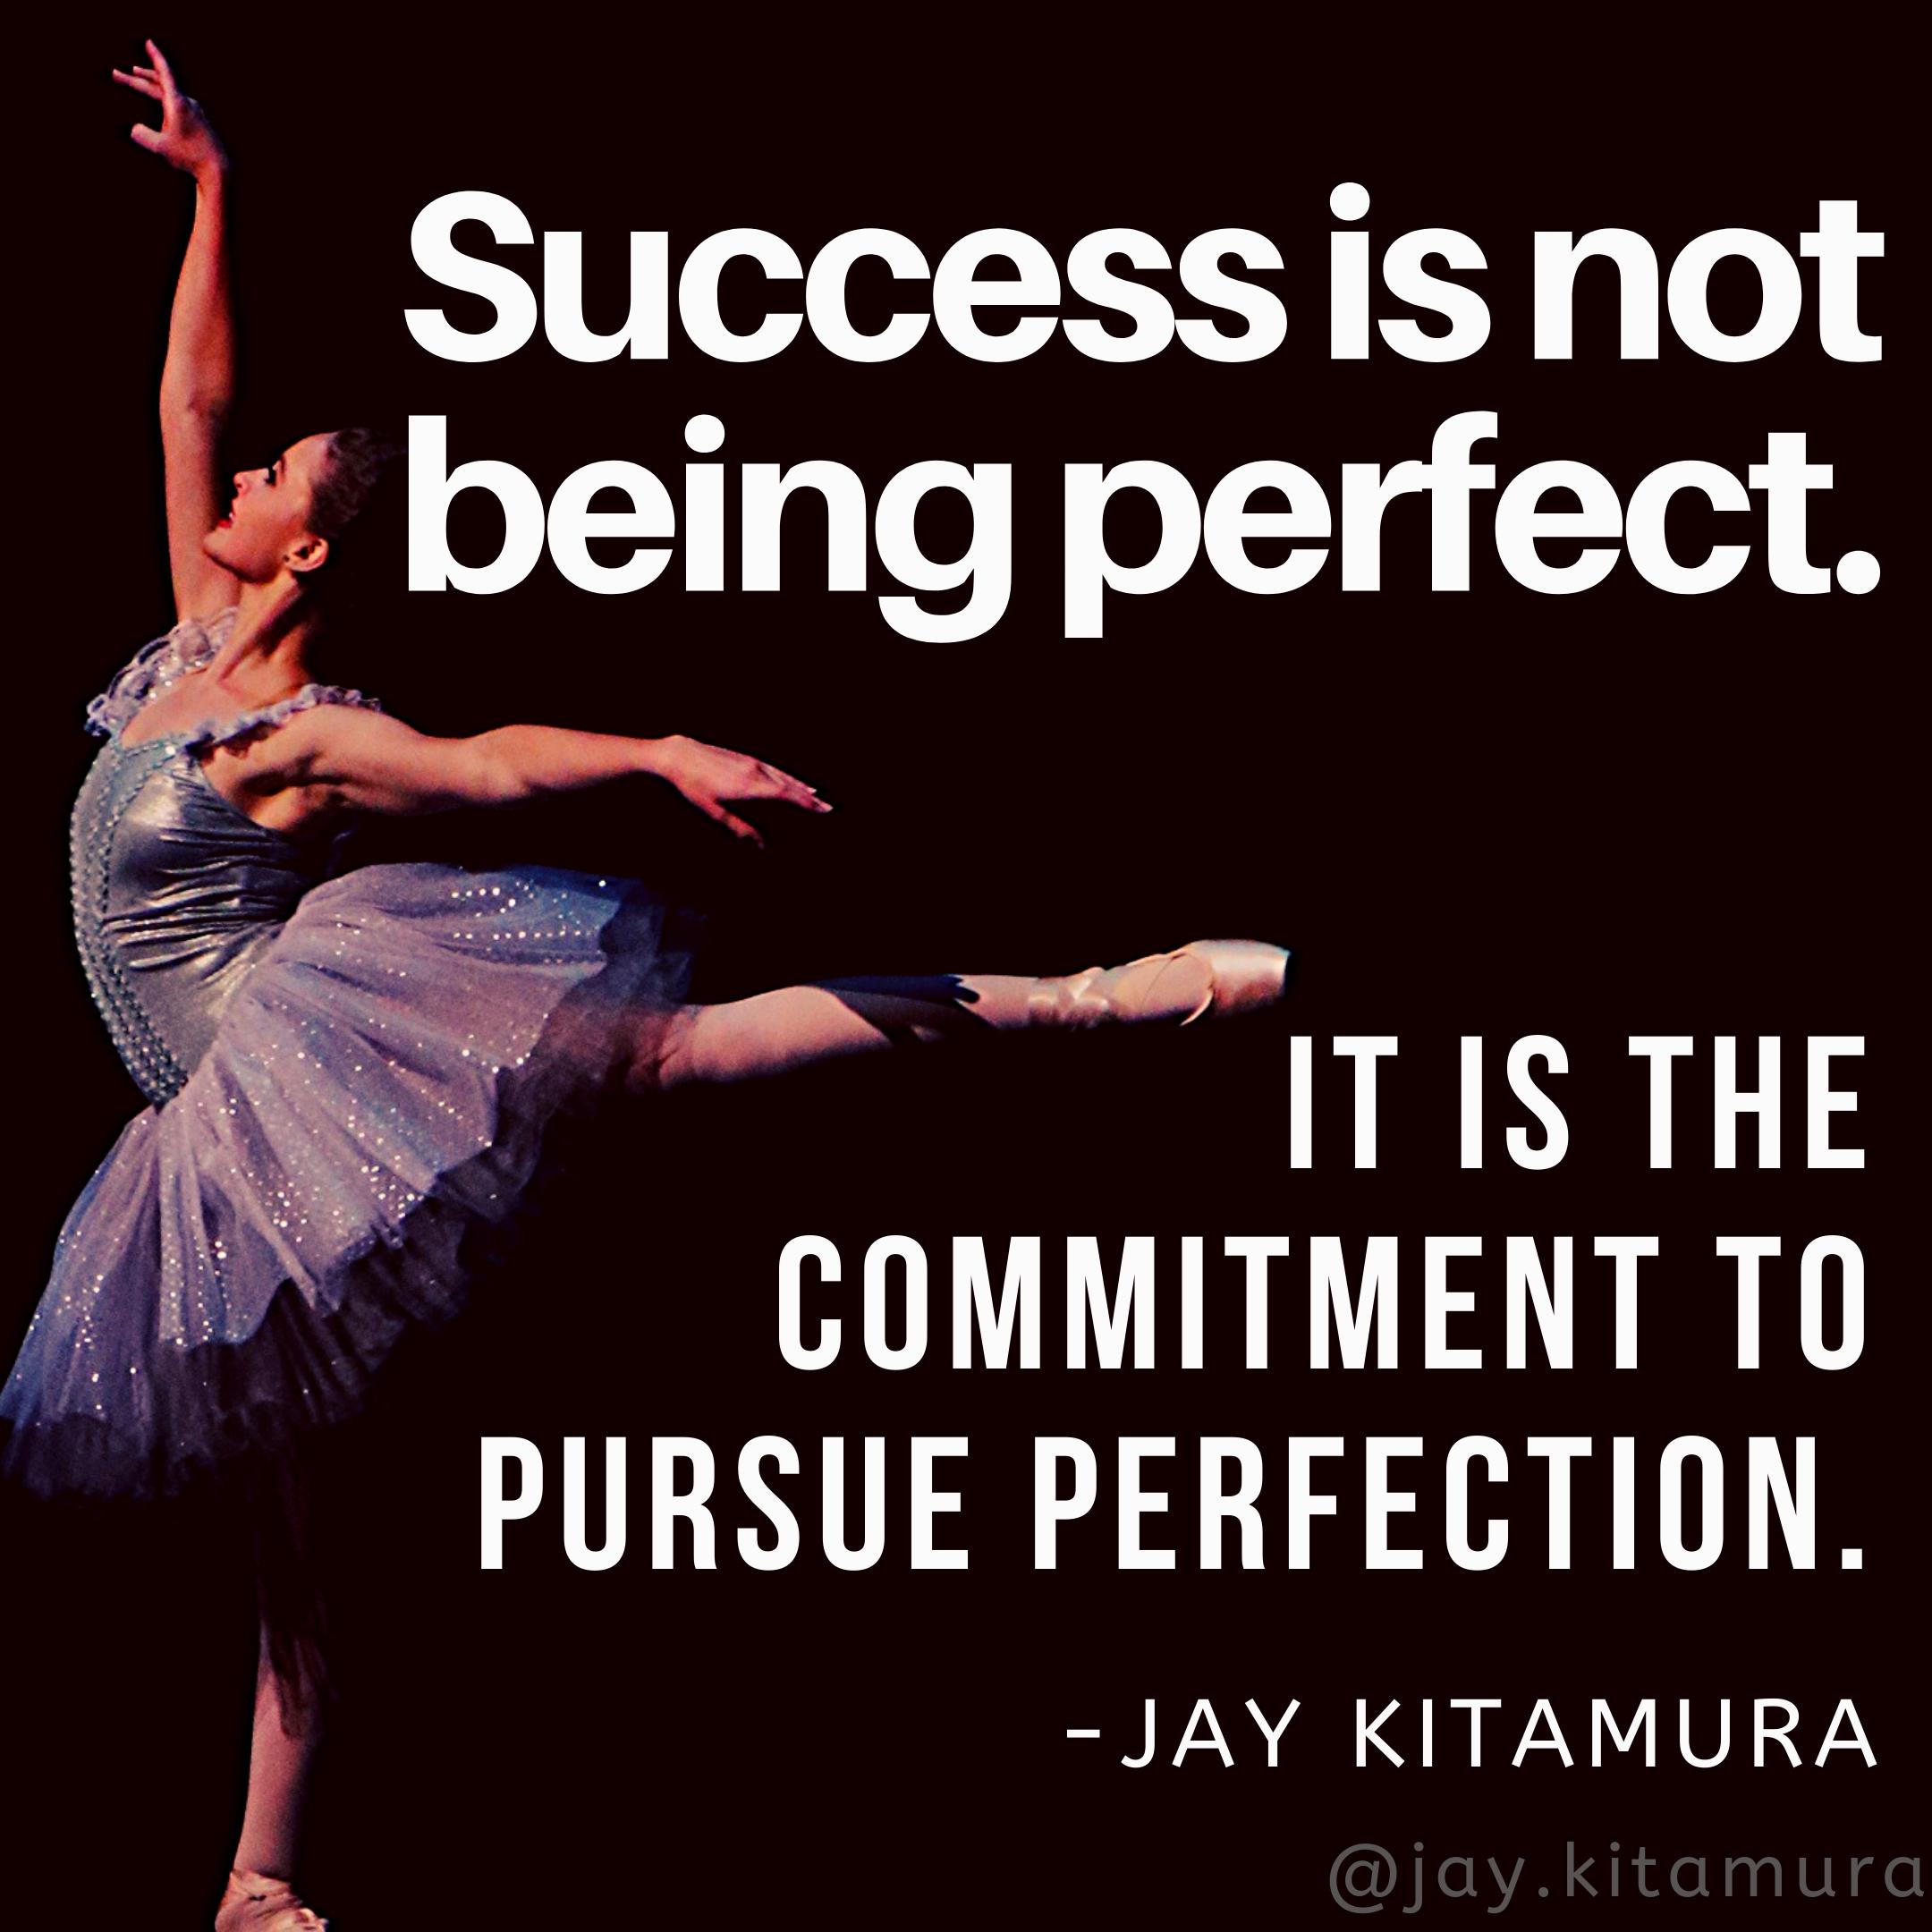 ". Success is not w being perfect. r9». ..! I .2"" 4' "" "".'V' r  a . ' .- , ' . "" .g' "" "" IN I . ,_ . "" A. .. ~ "" » '. s ' . , ,3: . , .4 ' _, -. - _ ' ¢ a- '; ..r-vr.-.. - "" '.,, , ~ ._  . , H ' . > c. .' _ .- . - ' - 'r . *' '_ ' .'9 O 'I.' .V l - . . ' , , 1' ~ .. . . _ , o - '- 2"" I"" I - . ' _.._l ' _ l v> , ' . IT IS THE COMMITMENT T0 PURSUE PERFECTION. -JAY KITAMURA https://inspirational.ly"